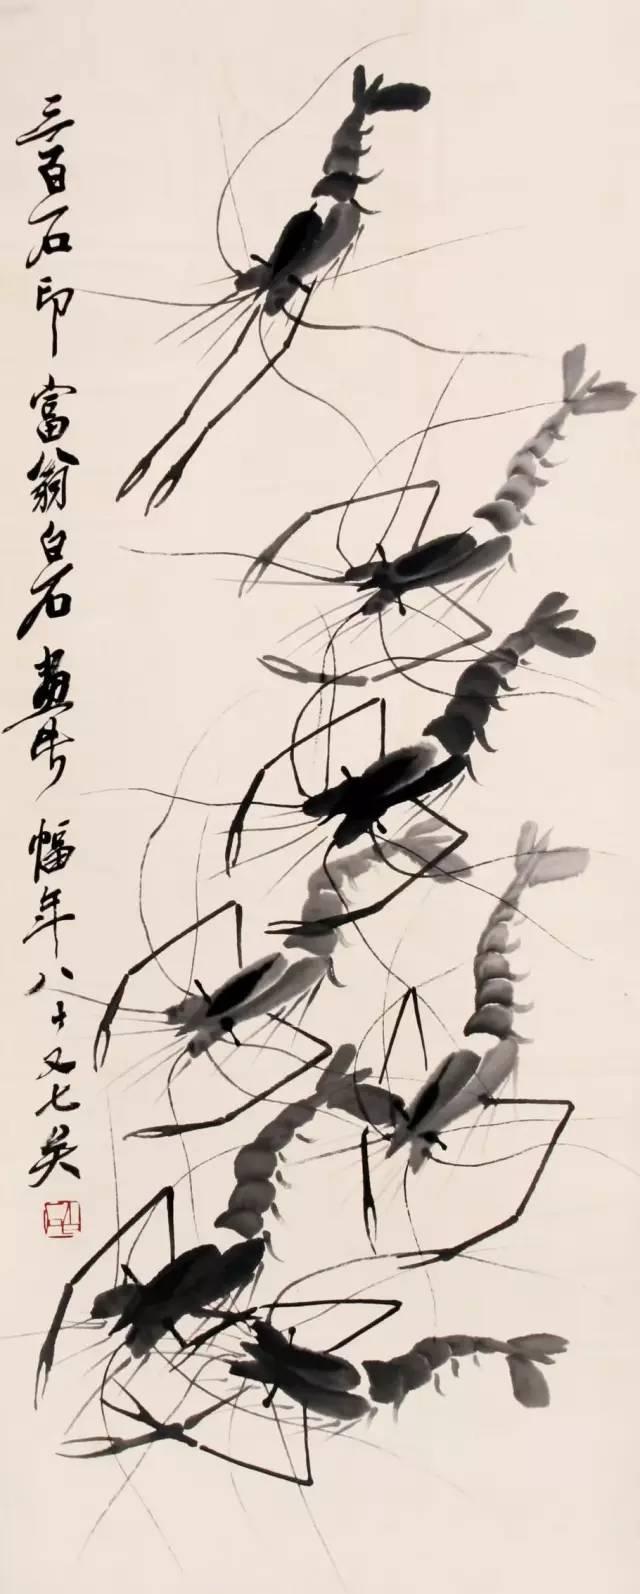 Chinese Painting Qi Bai Shi Shrimp